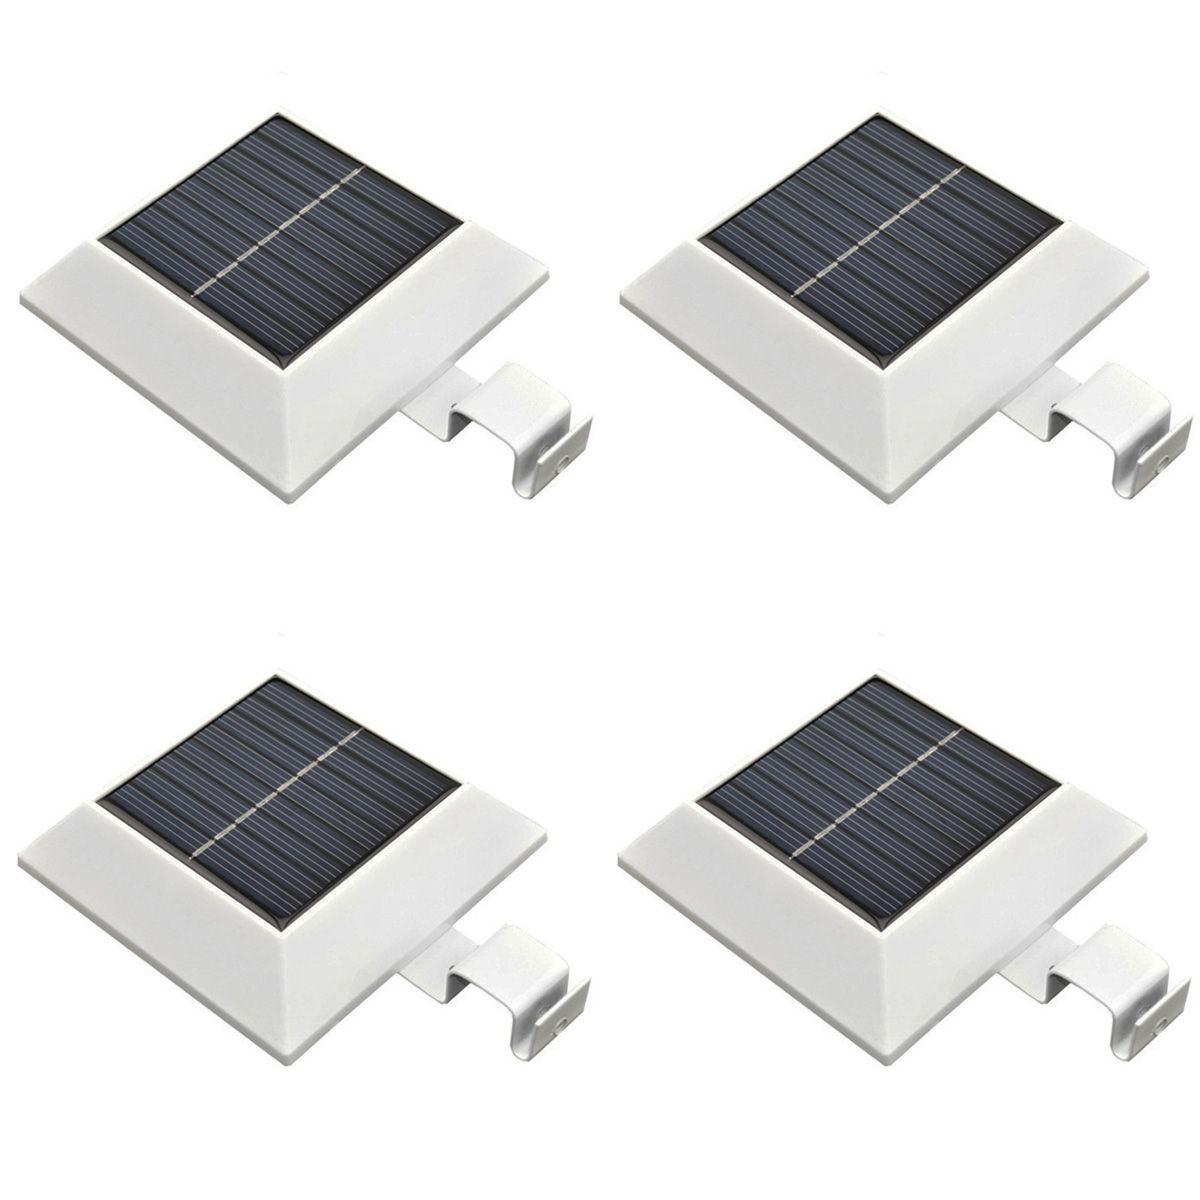 Jiawenピースpirモーションセンサーledソーラーパワーled屋外ランプ